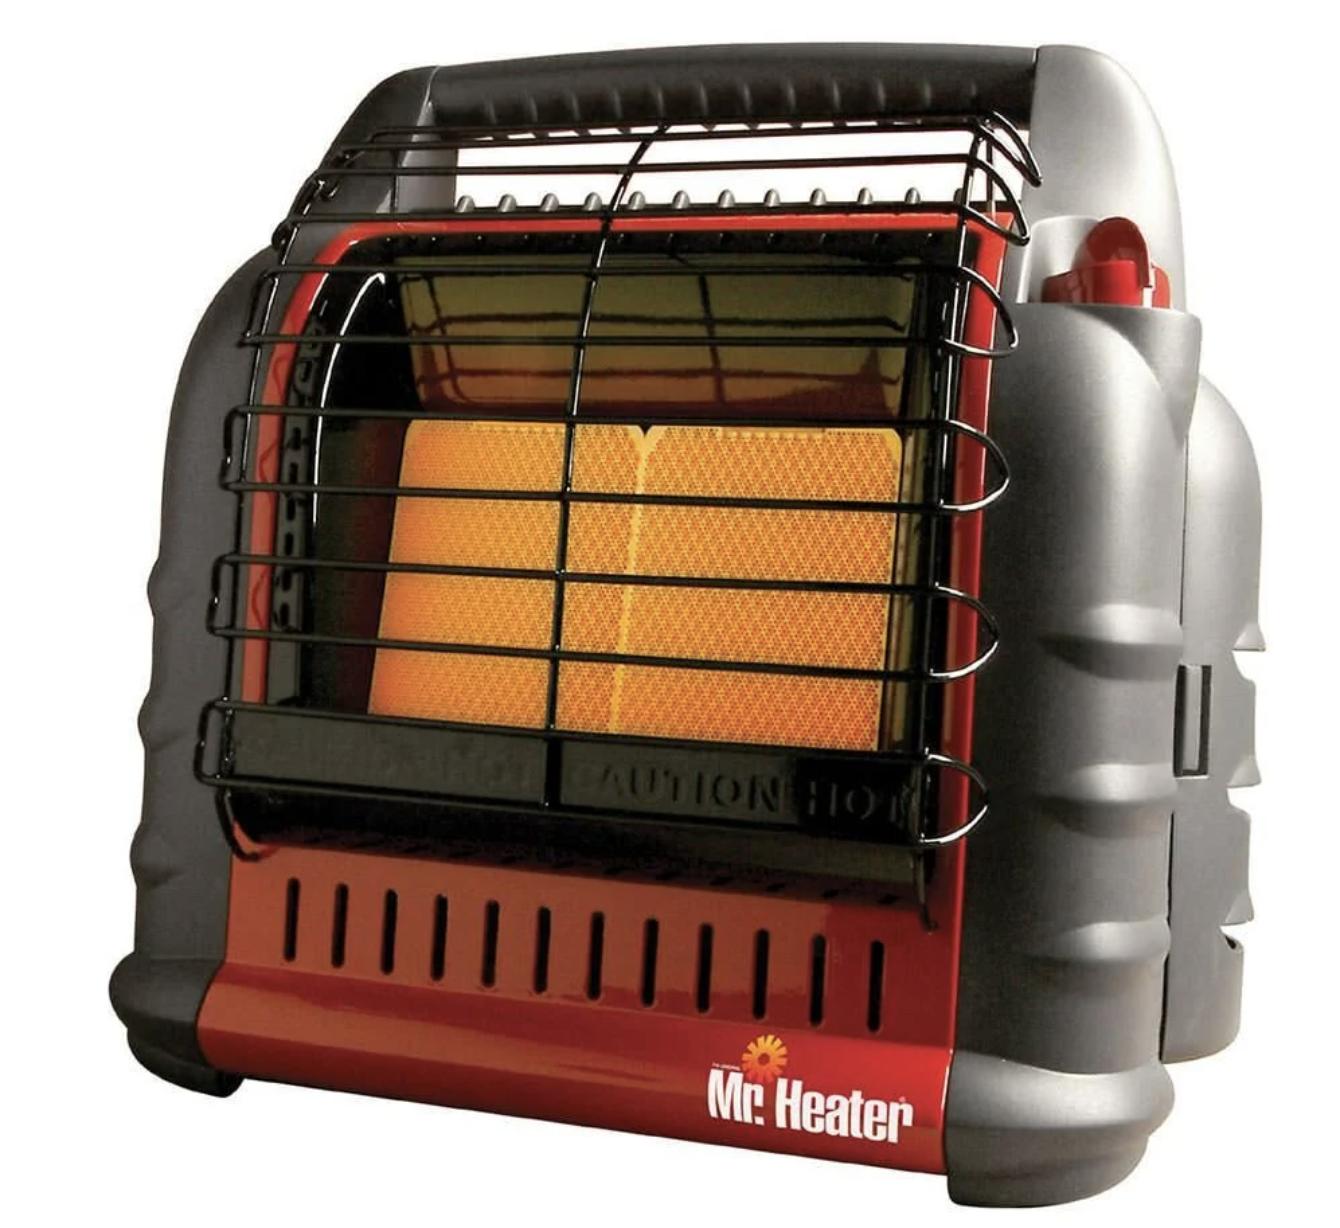 Mr. heater big buddy portable space heater